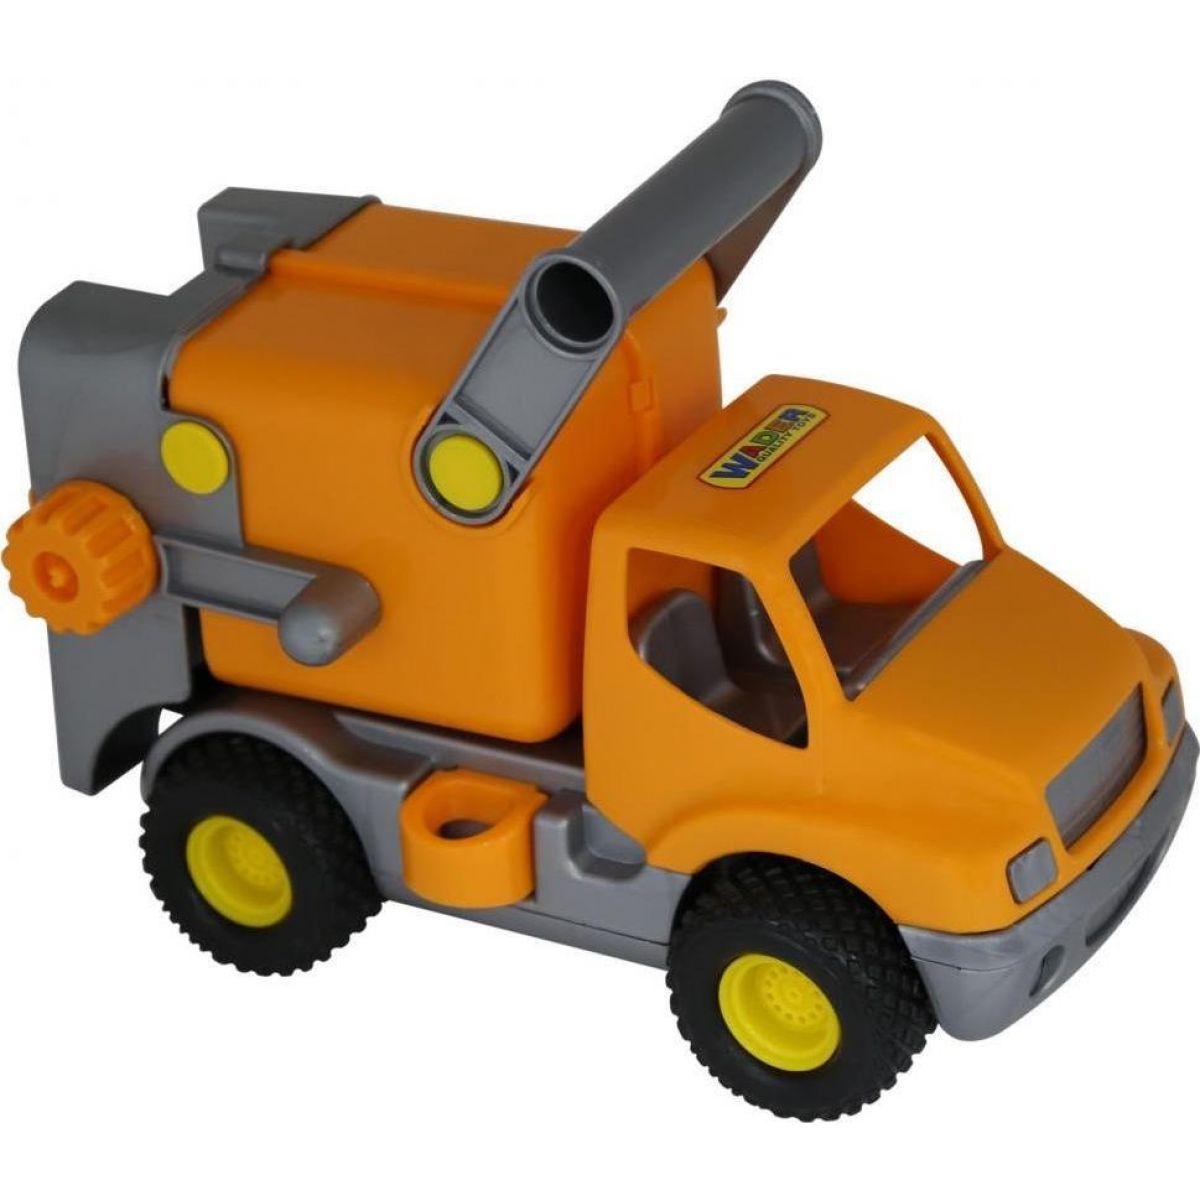 Polesie Auto ConsTruck popeláři - oranžové